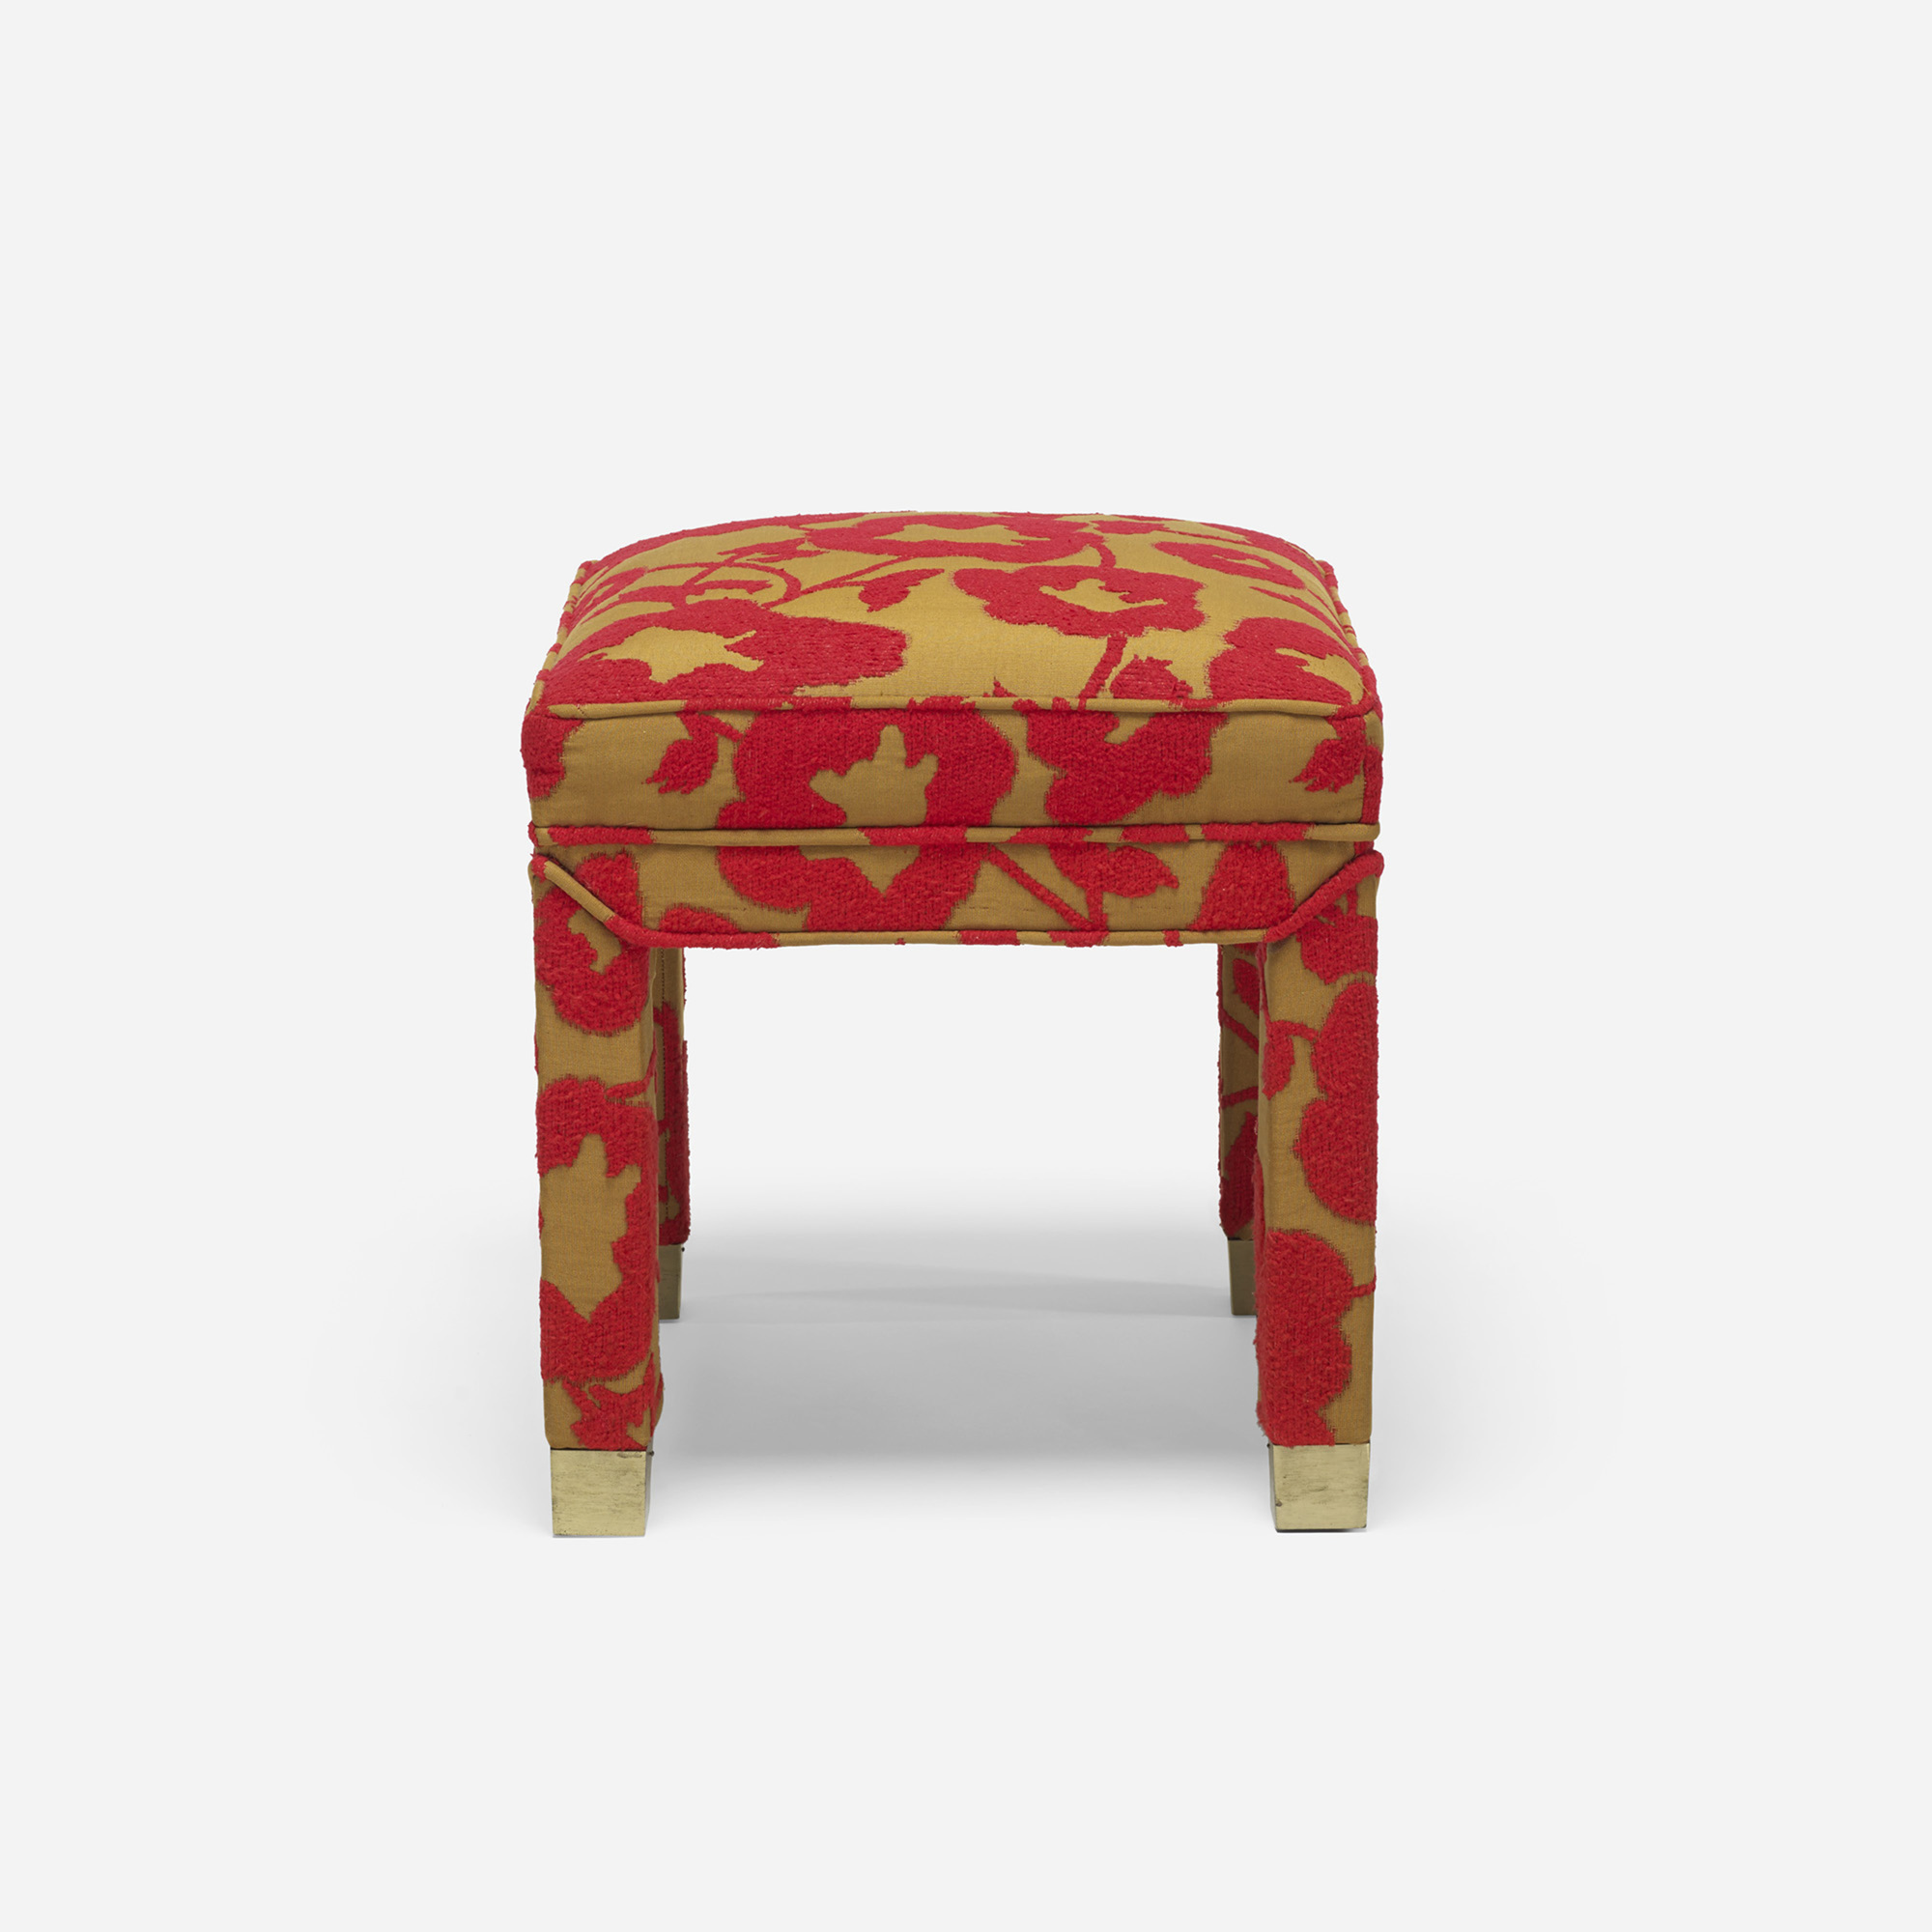 213: American / stool (2 of 4)